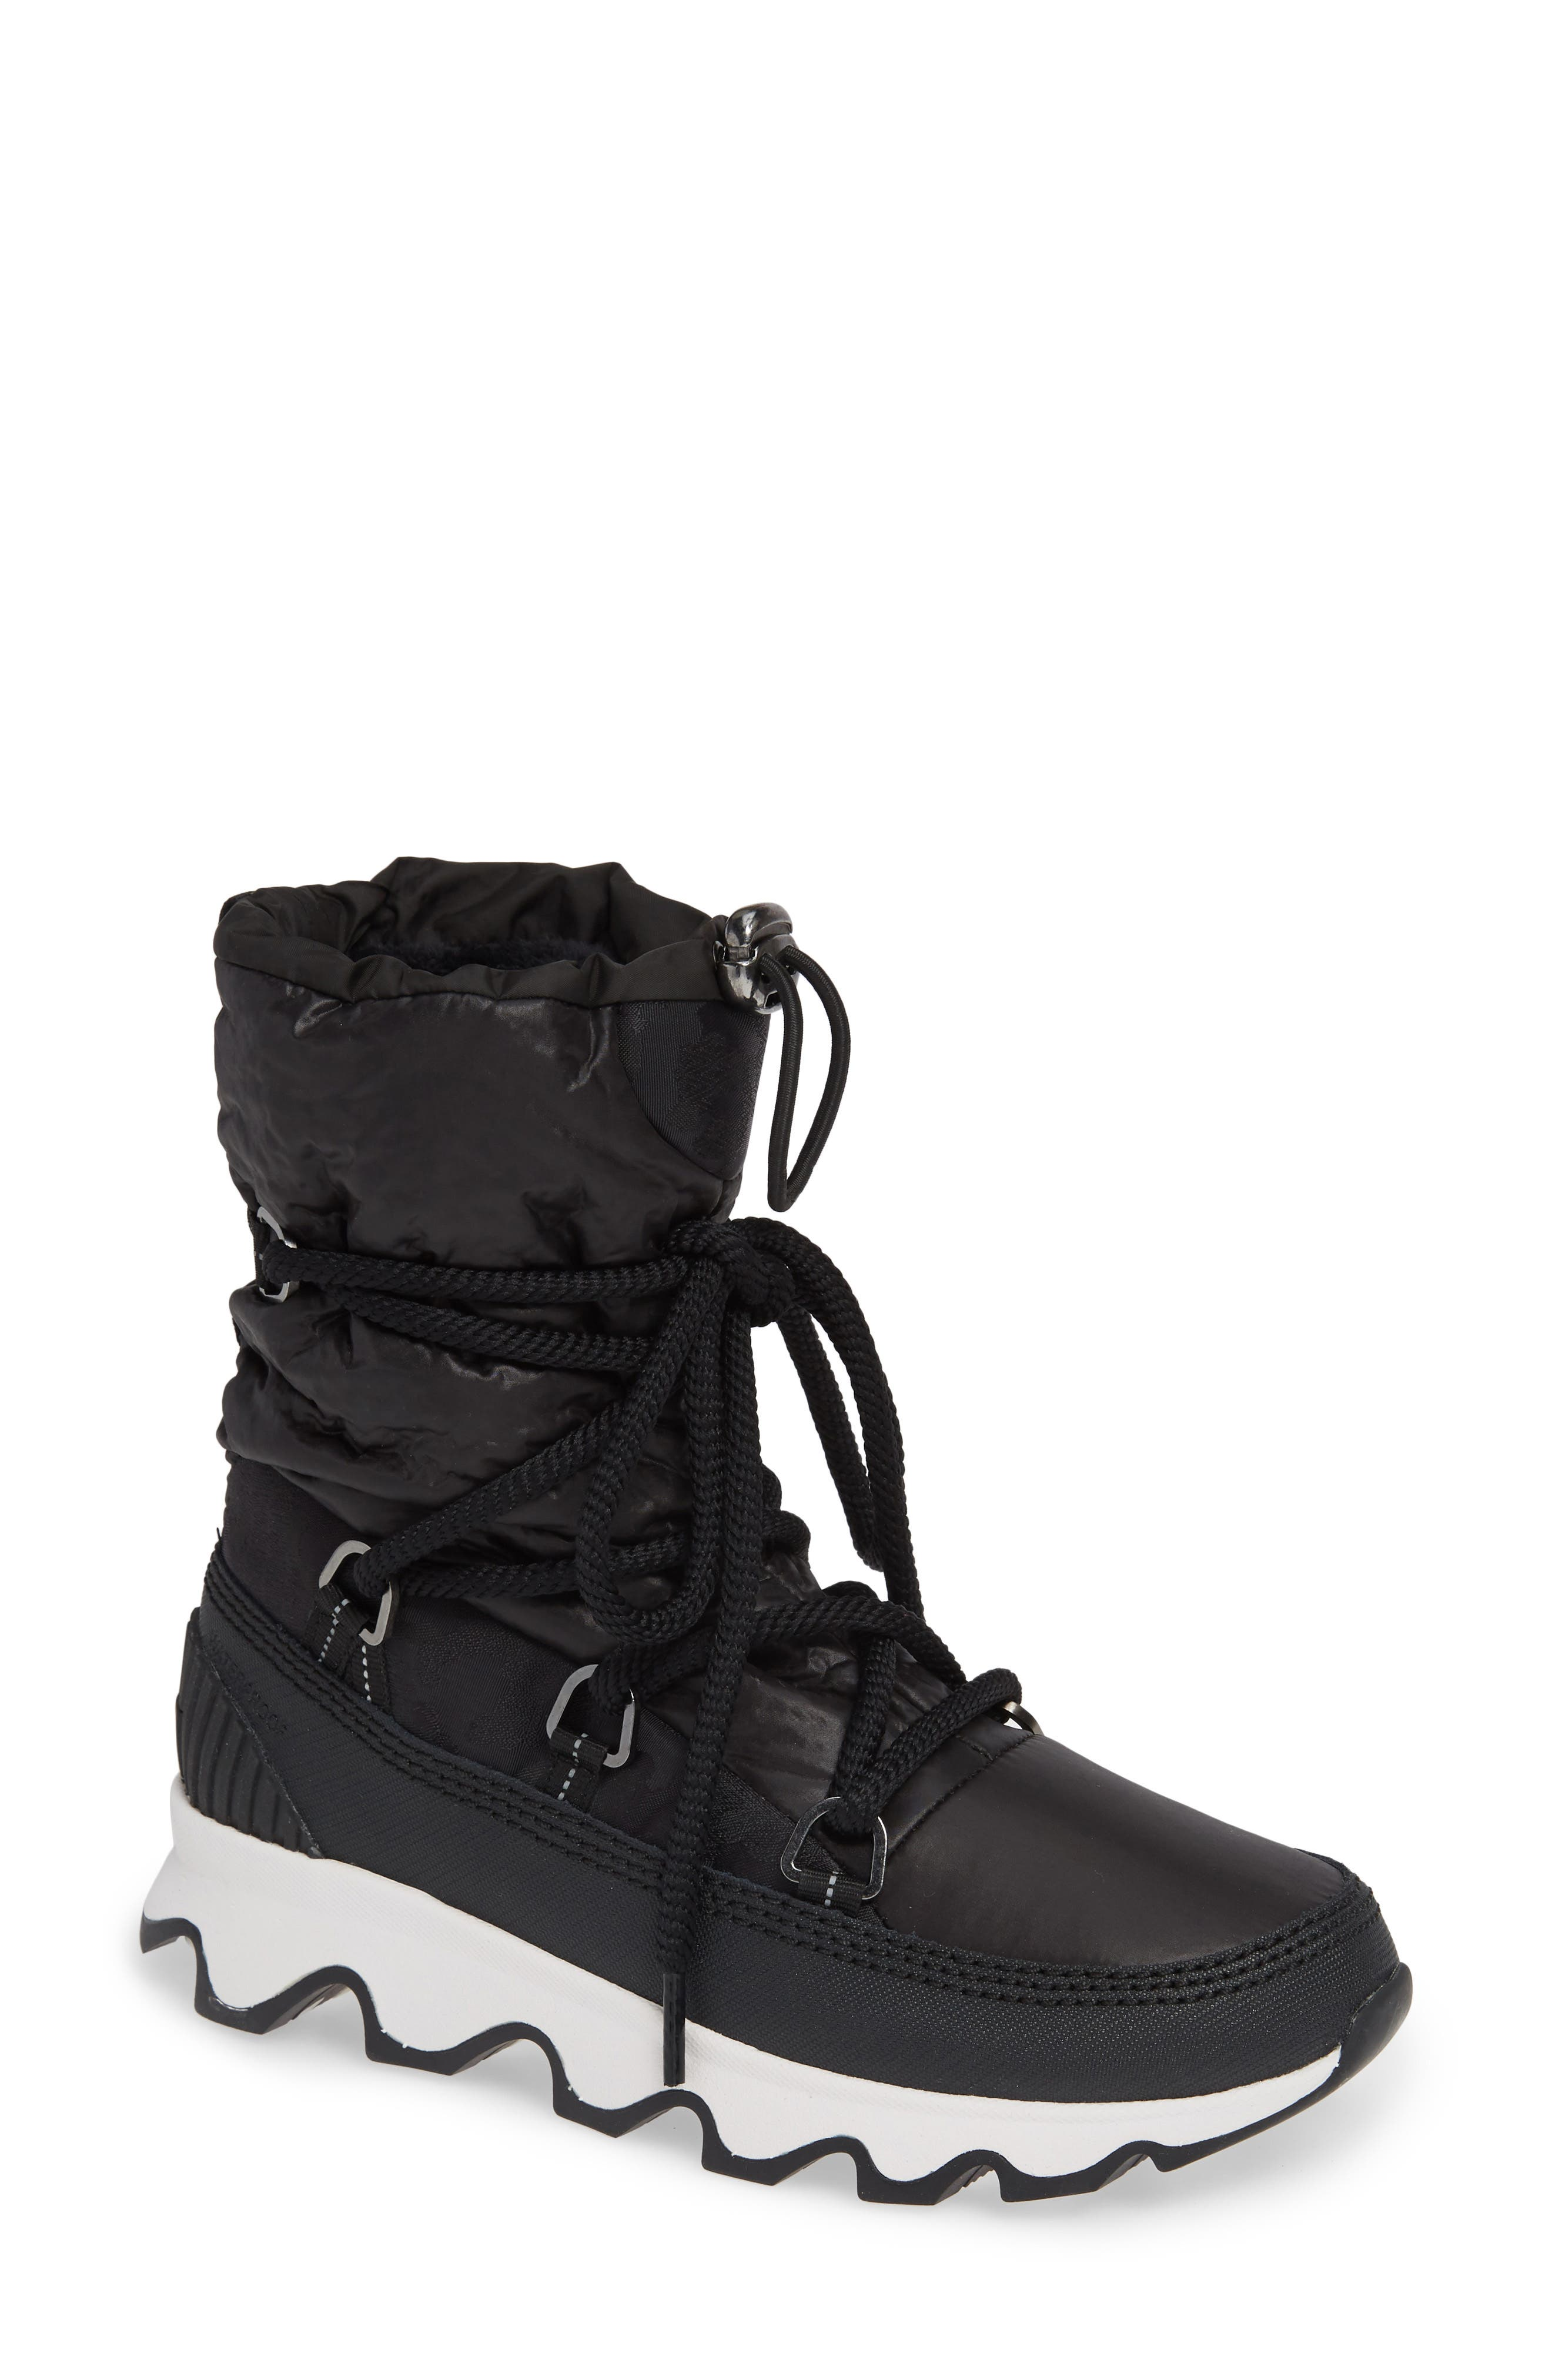 Sorel Kinetic Waterproof Insulated Winter Boot